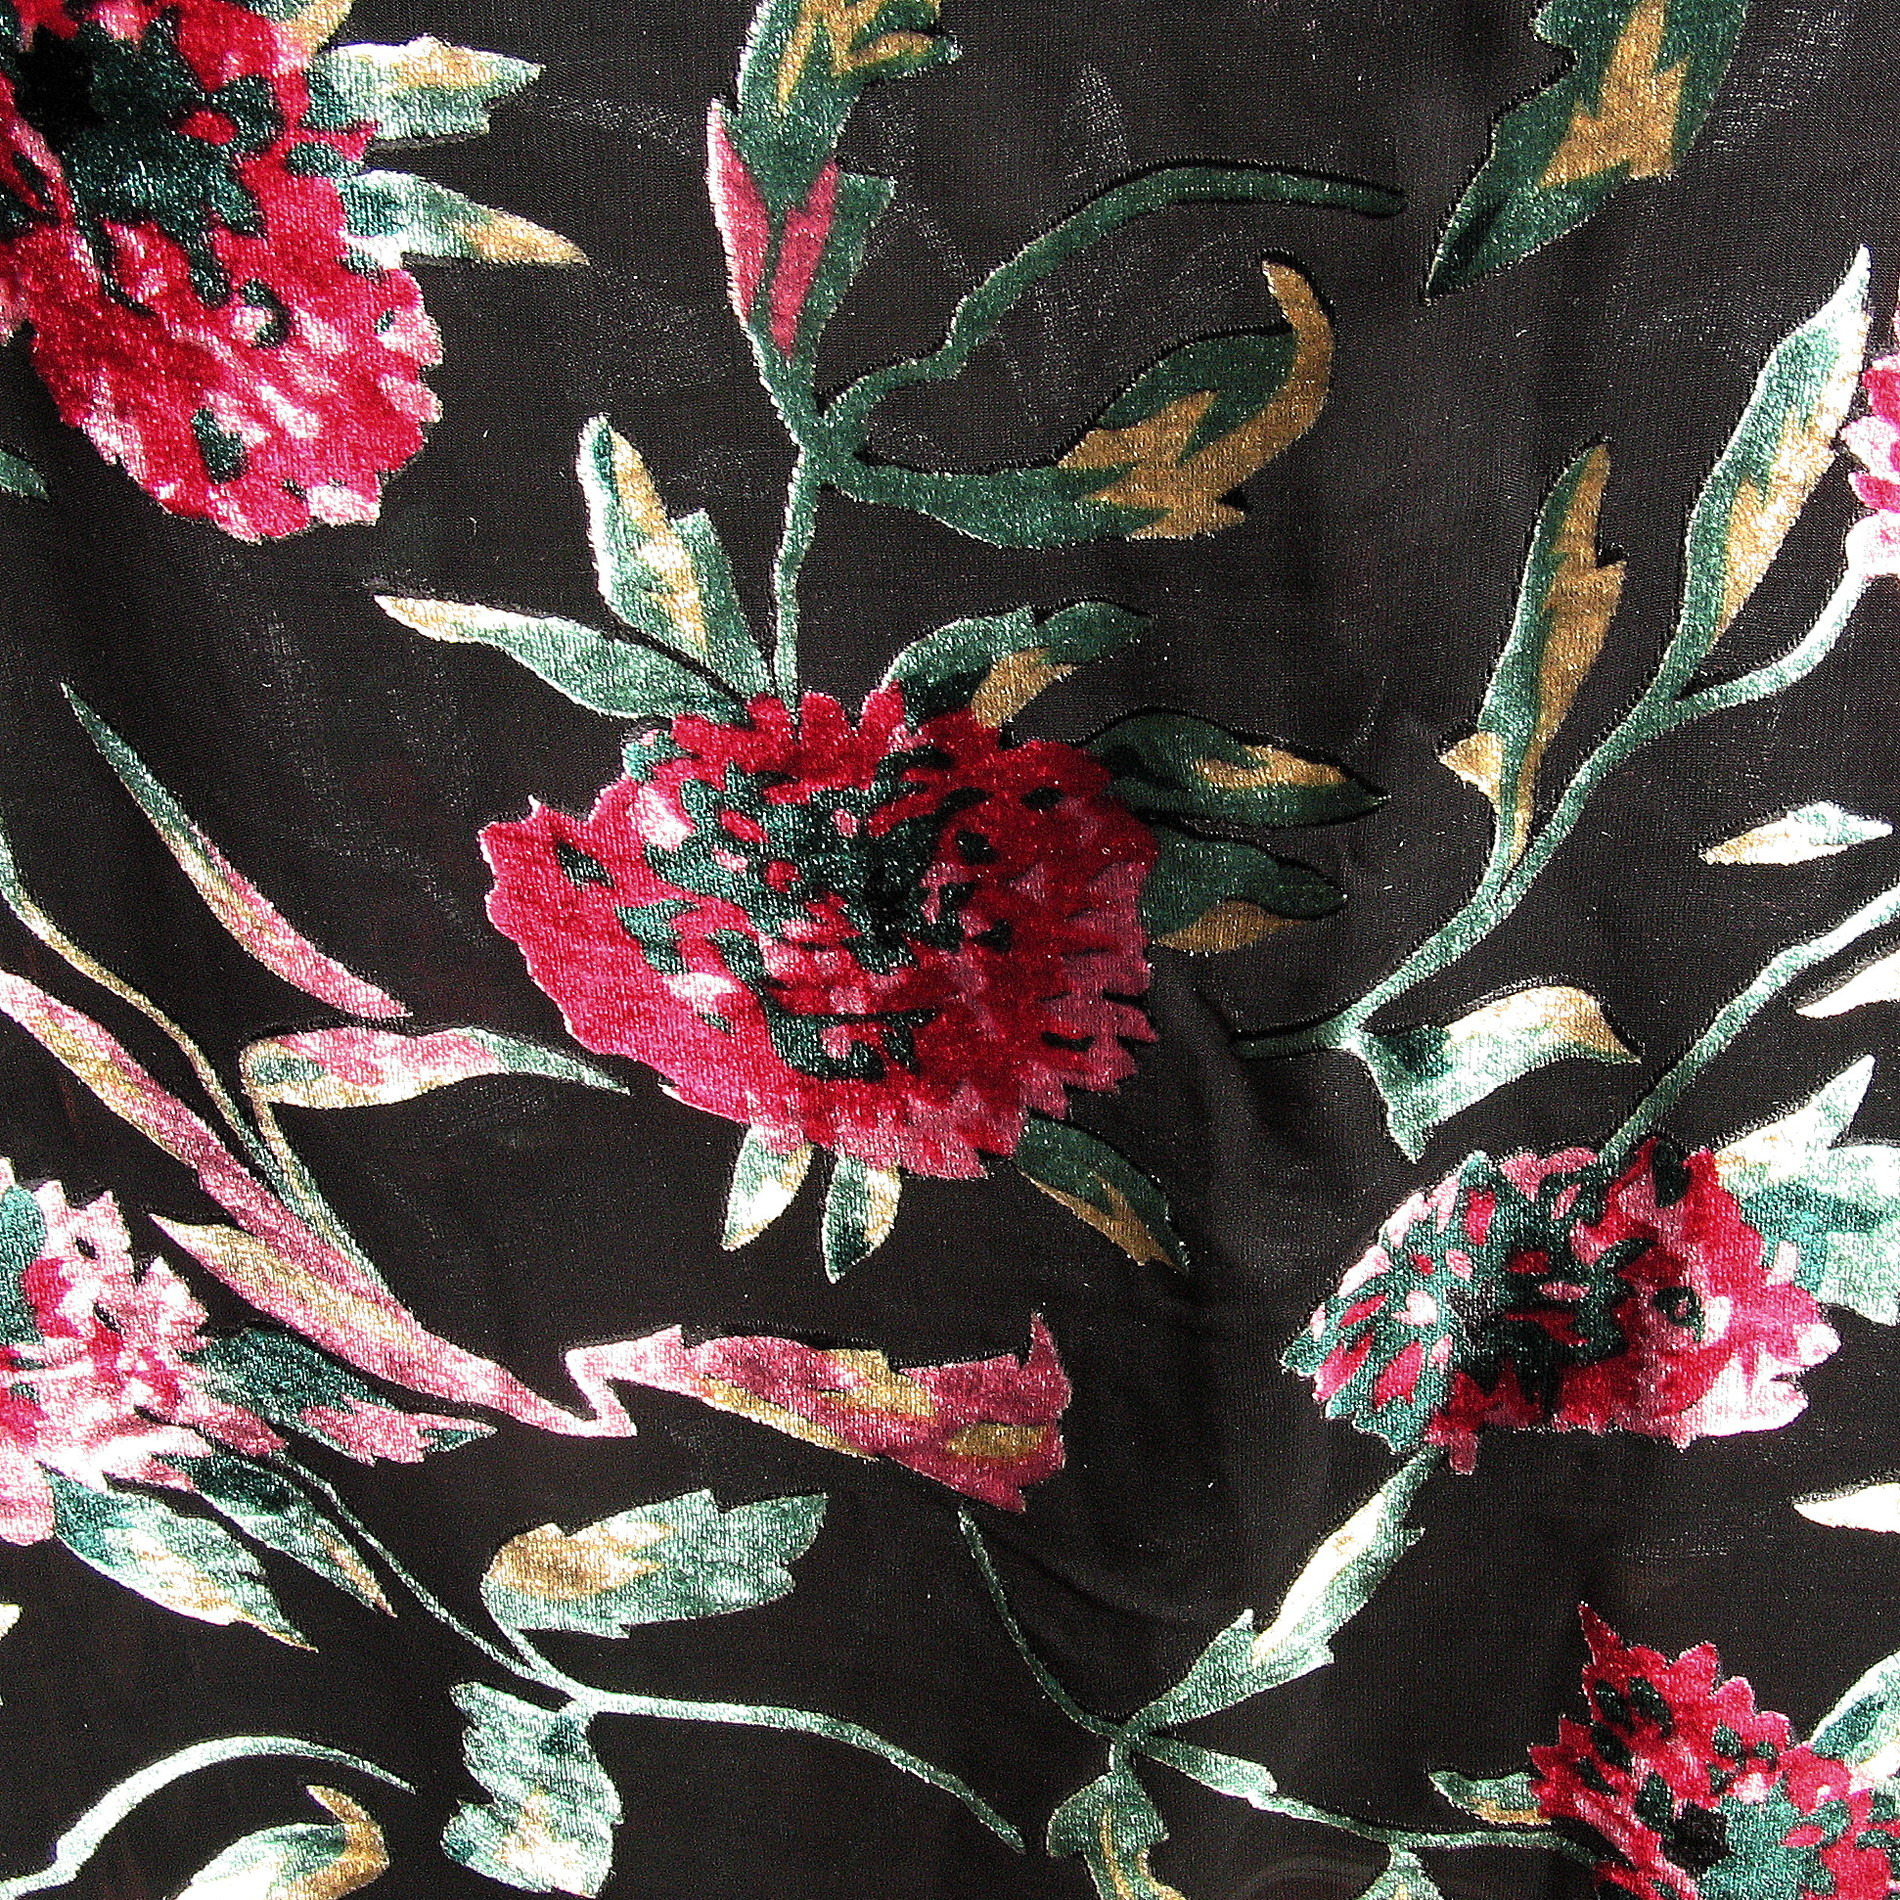 seiden ausbrenner ranken blumen in schwarz burgund rot nougat gr n gemusterte stoffe. Black Bedroom Furniture Sets. Home Design Ideas